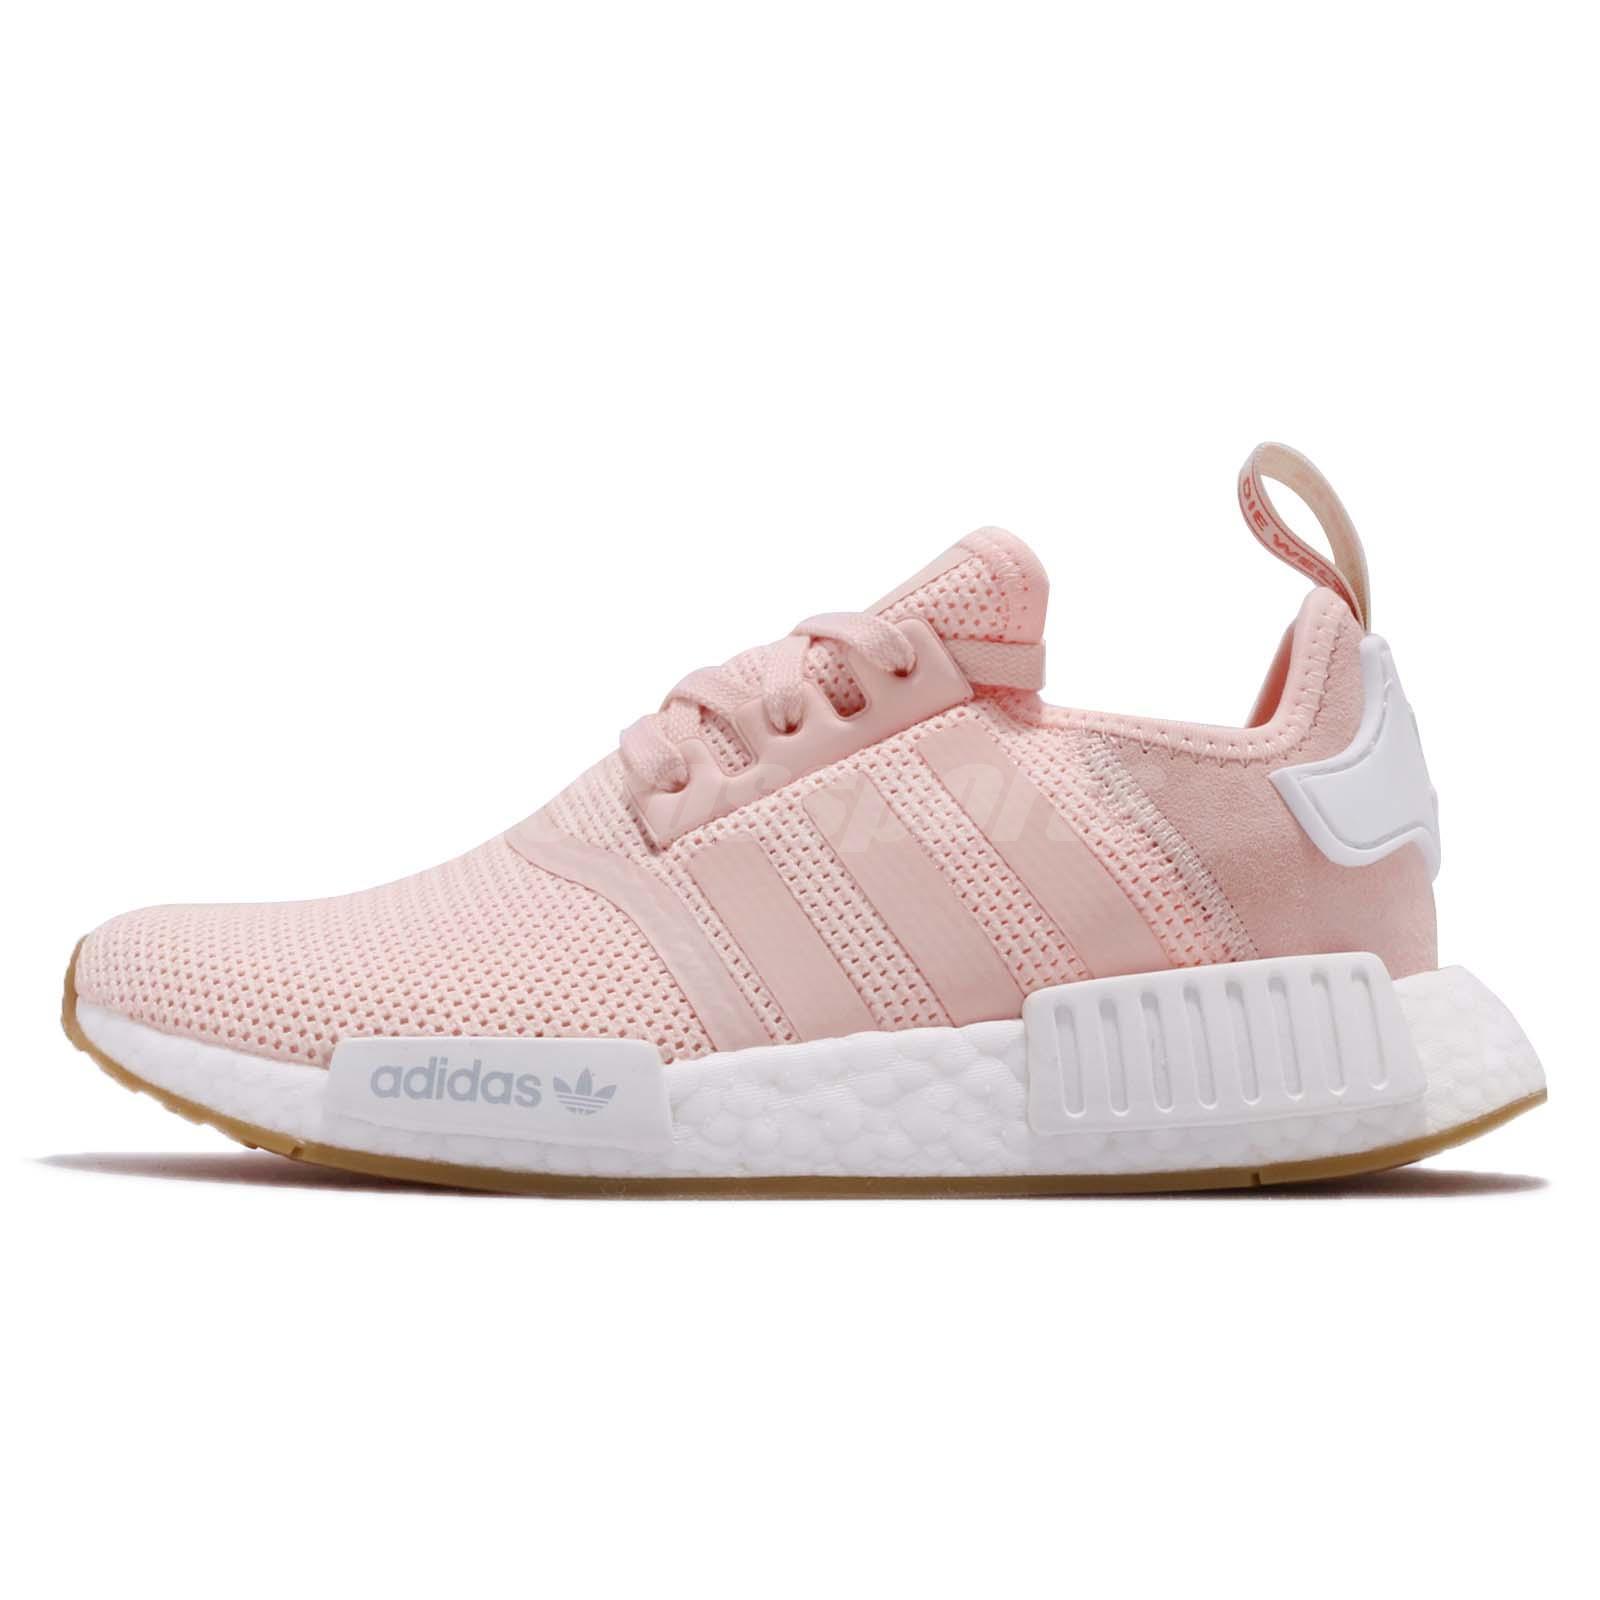 3a14978b9c7 adidas Originals NMD R1 W Boost Pink White Gum Women Running Shoe Sneaker  BB7588